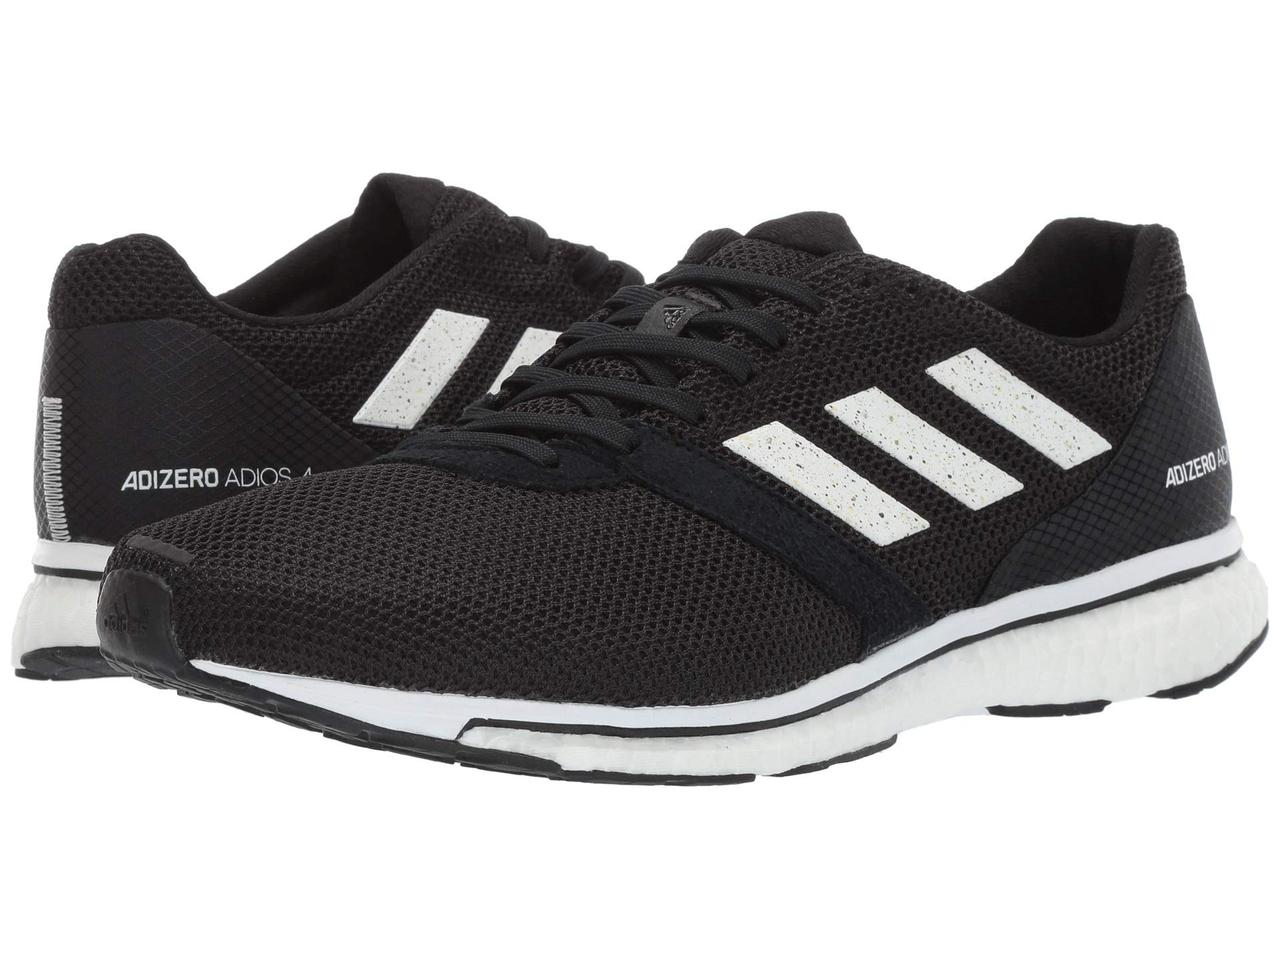 98fe2acb Кроссовки/Кеды (Оригинал) adidas Running Adizero Adios 4 Core  Black/Footwear White